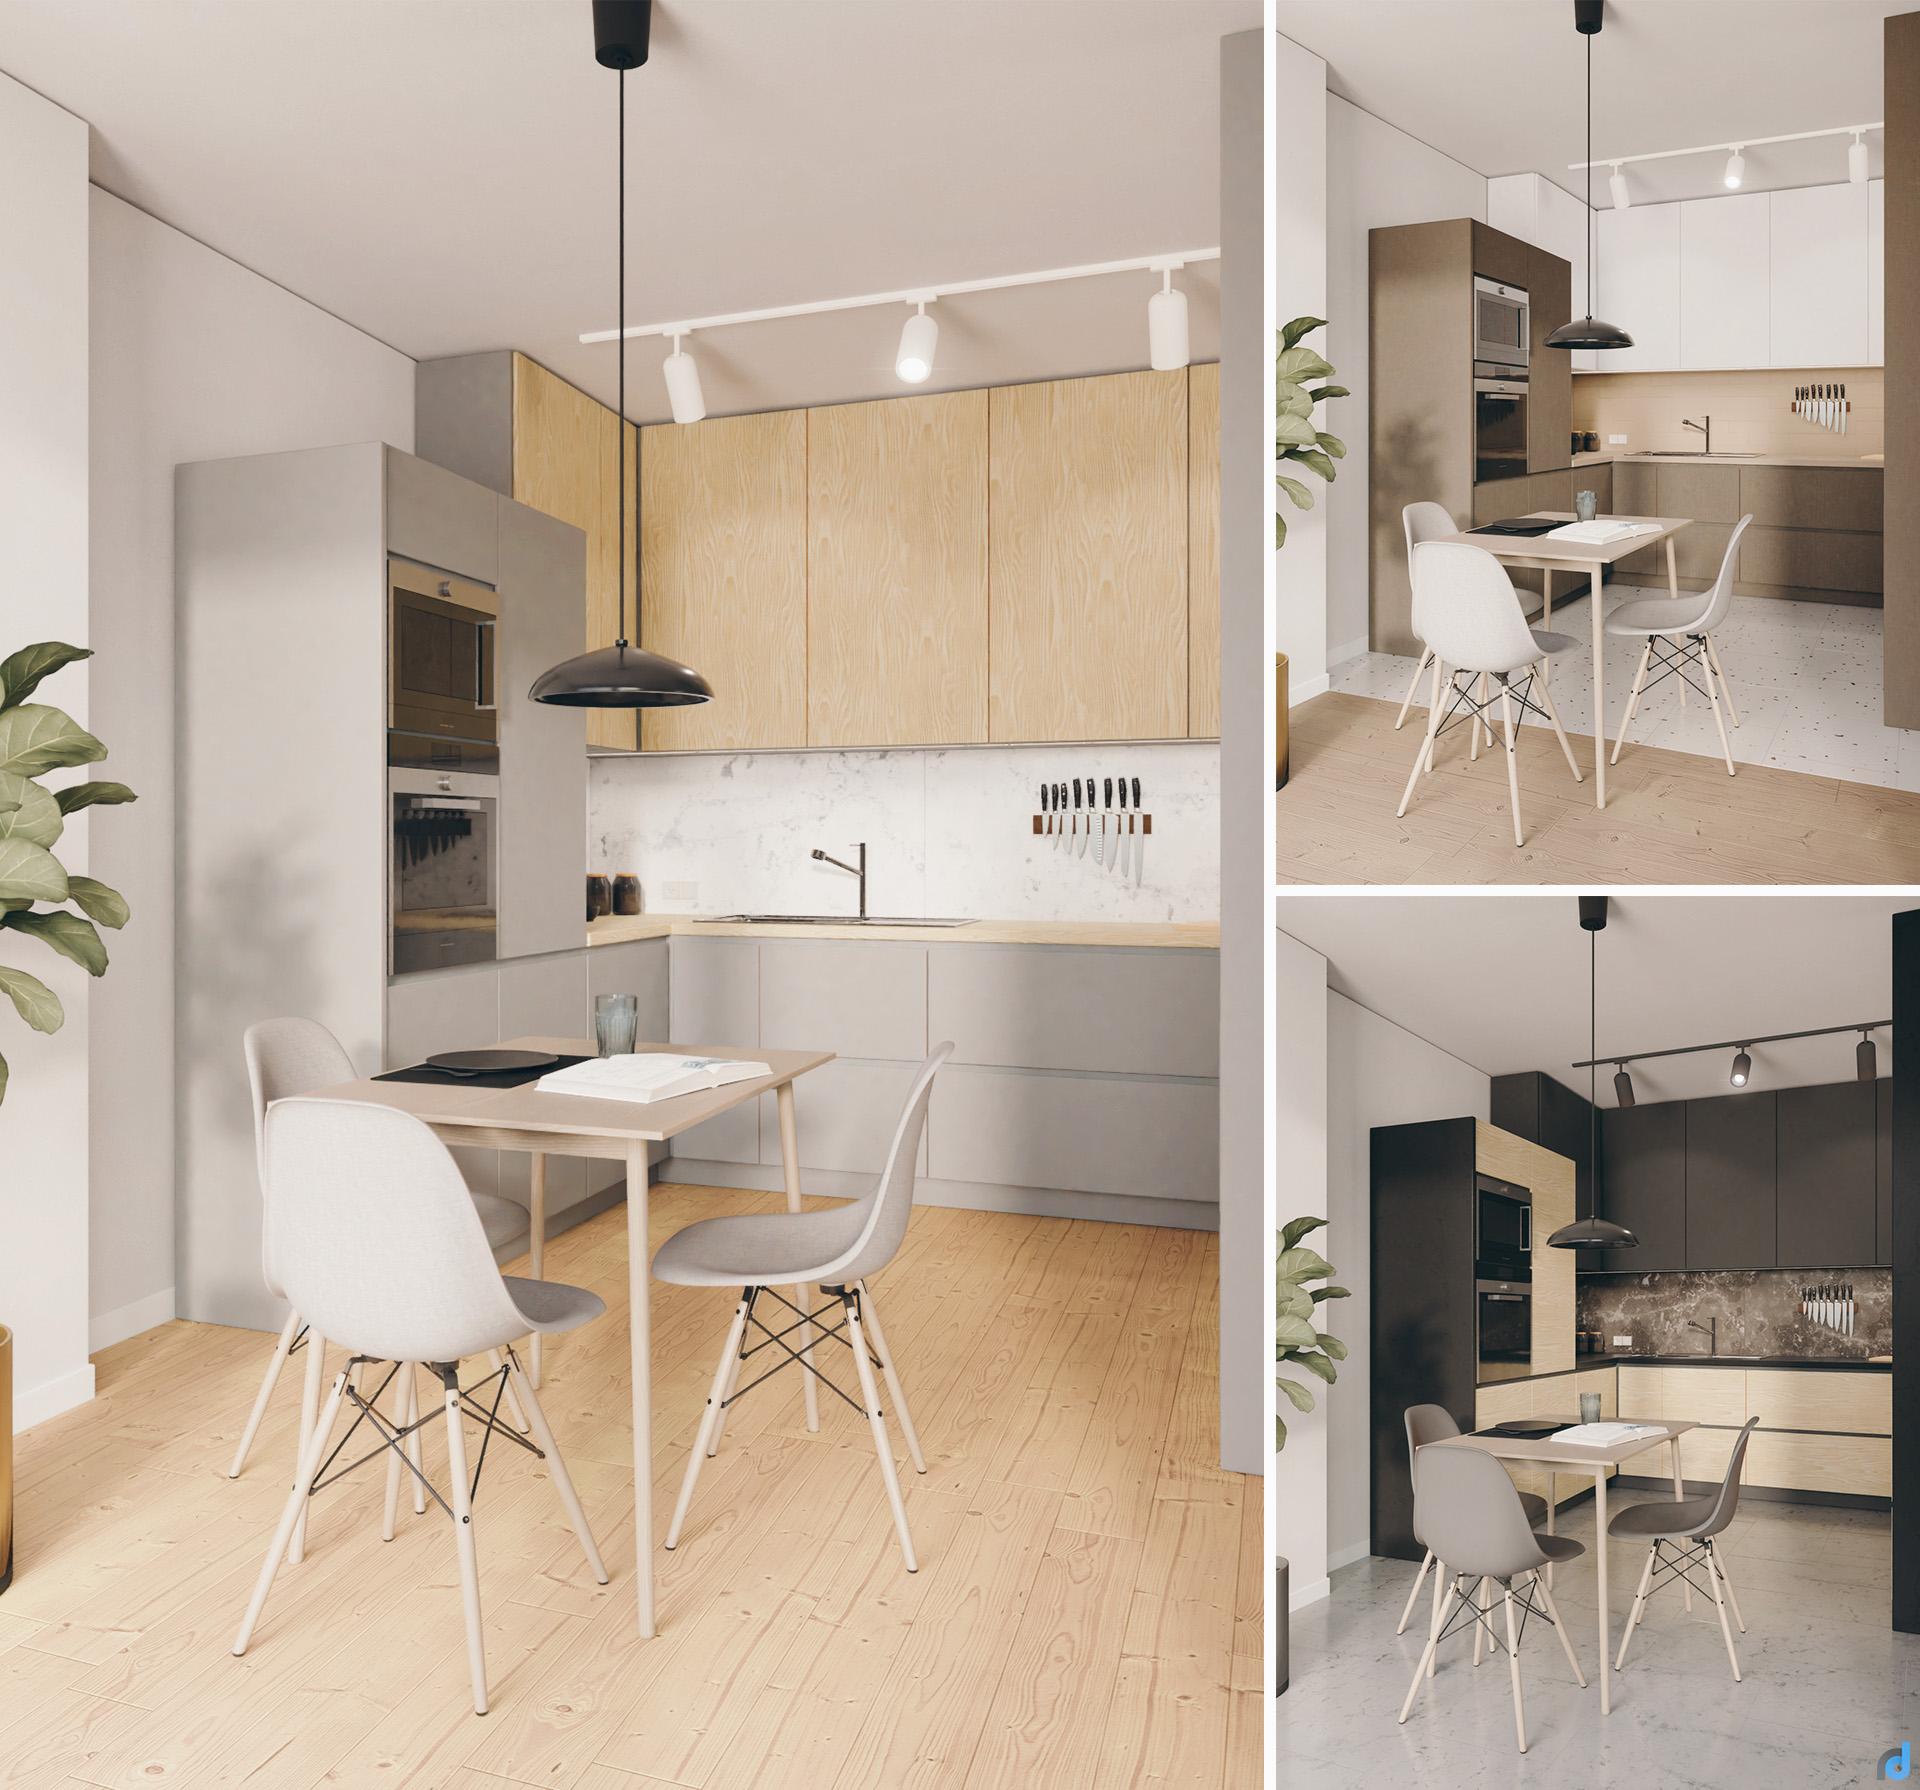 Apartment kitchen design variations